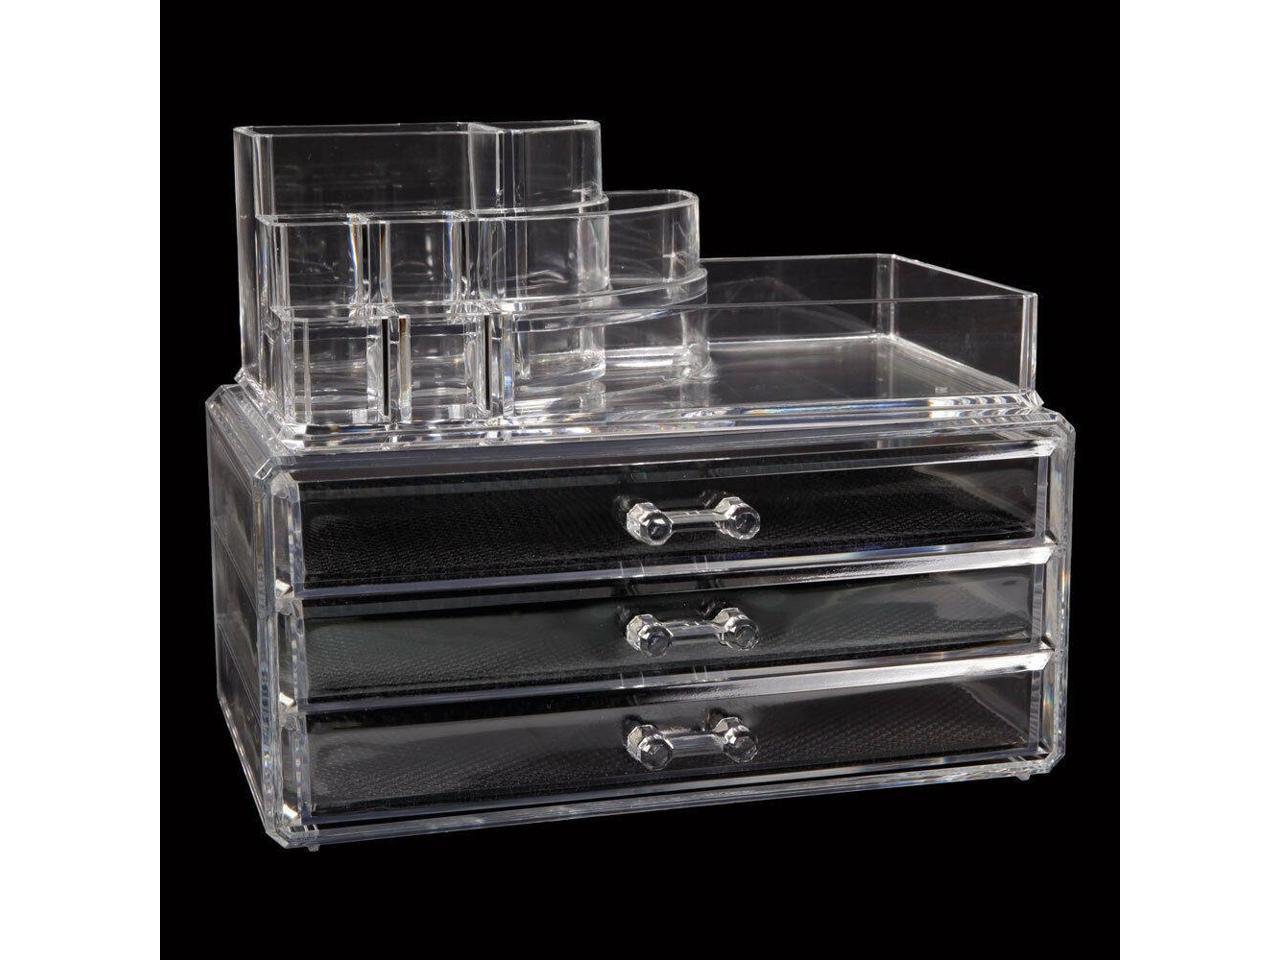 Makeup Cosmetics Jewelry Organizer Display Box Storage W Drawers Space Saving Newegg Com